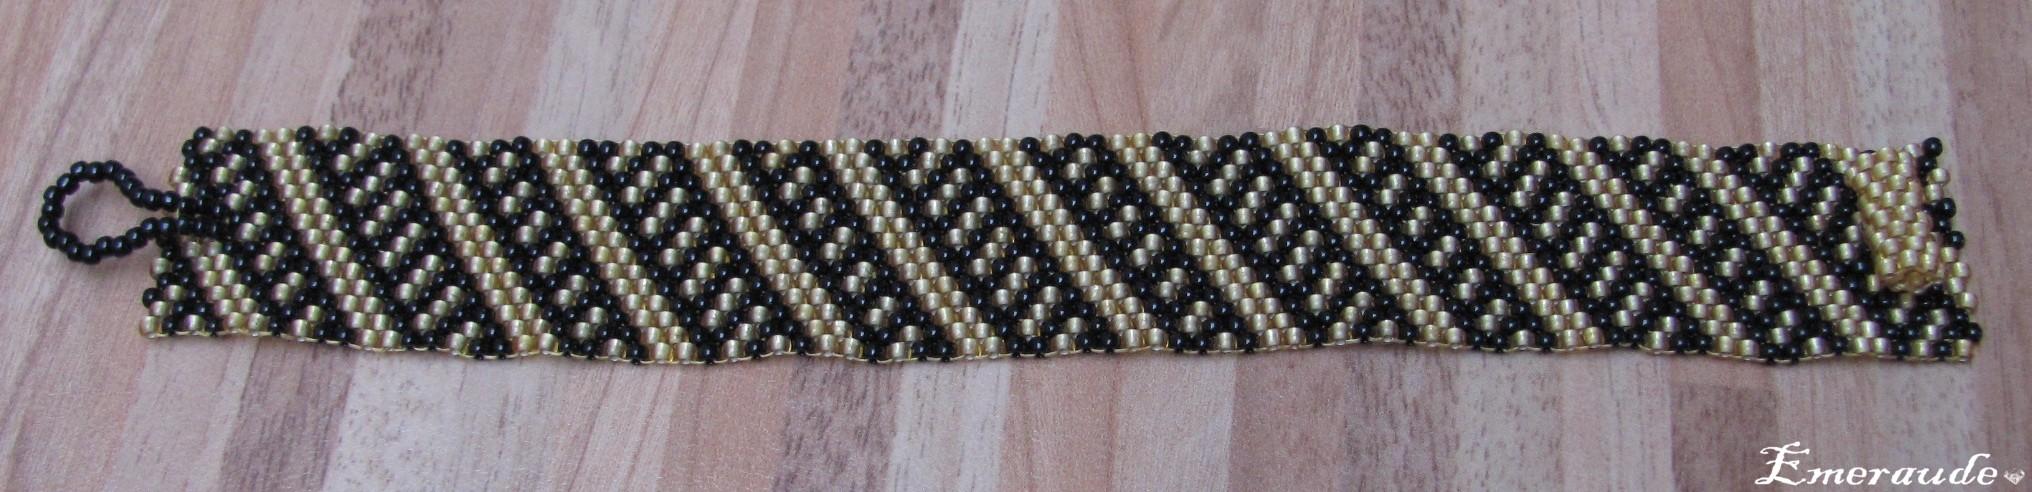 Tissage peyote: bracelet à diagonales